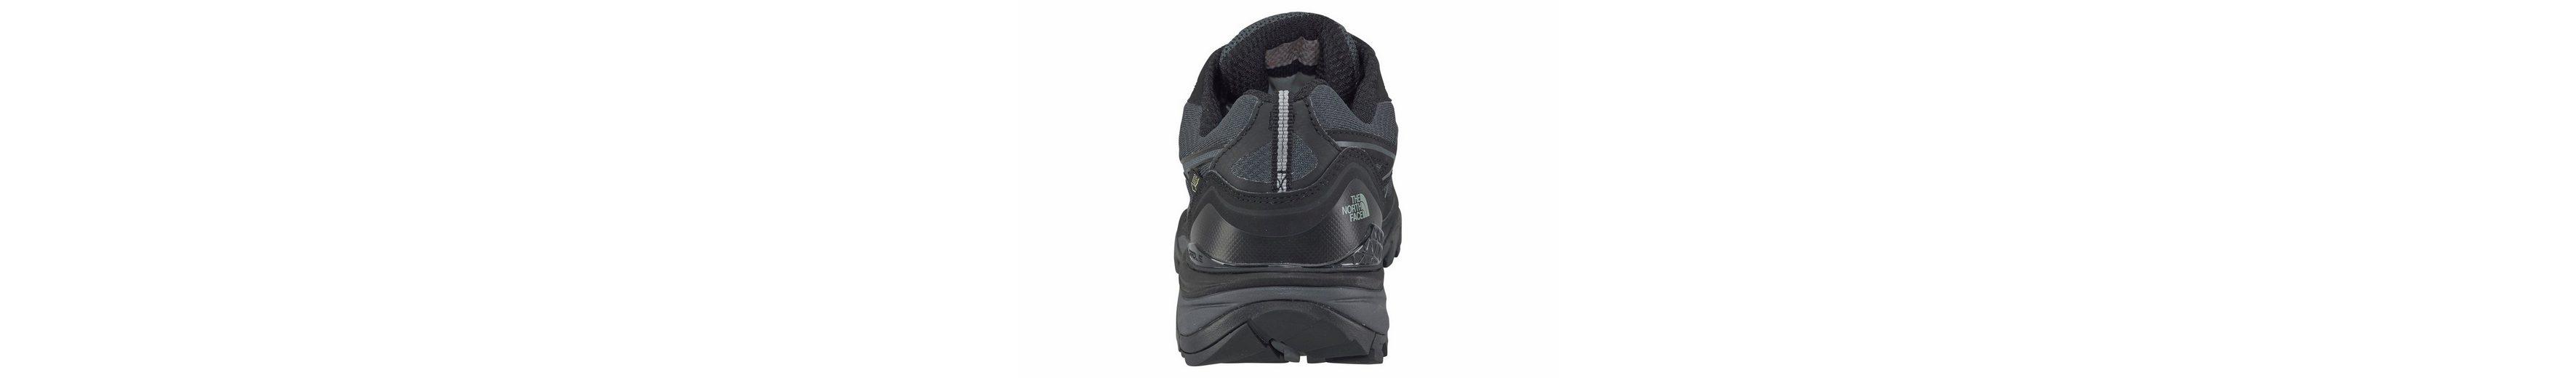 The North Face Men´s Hedgehog Fastpack Goretex Outdoorschuh, Goretex